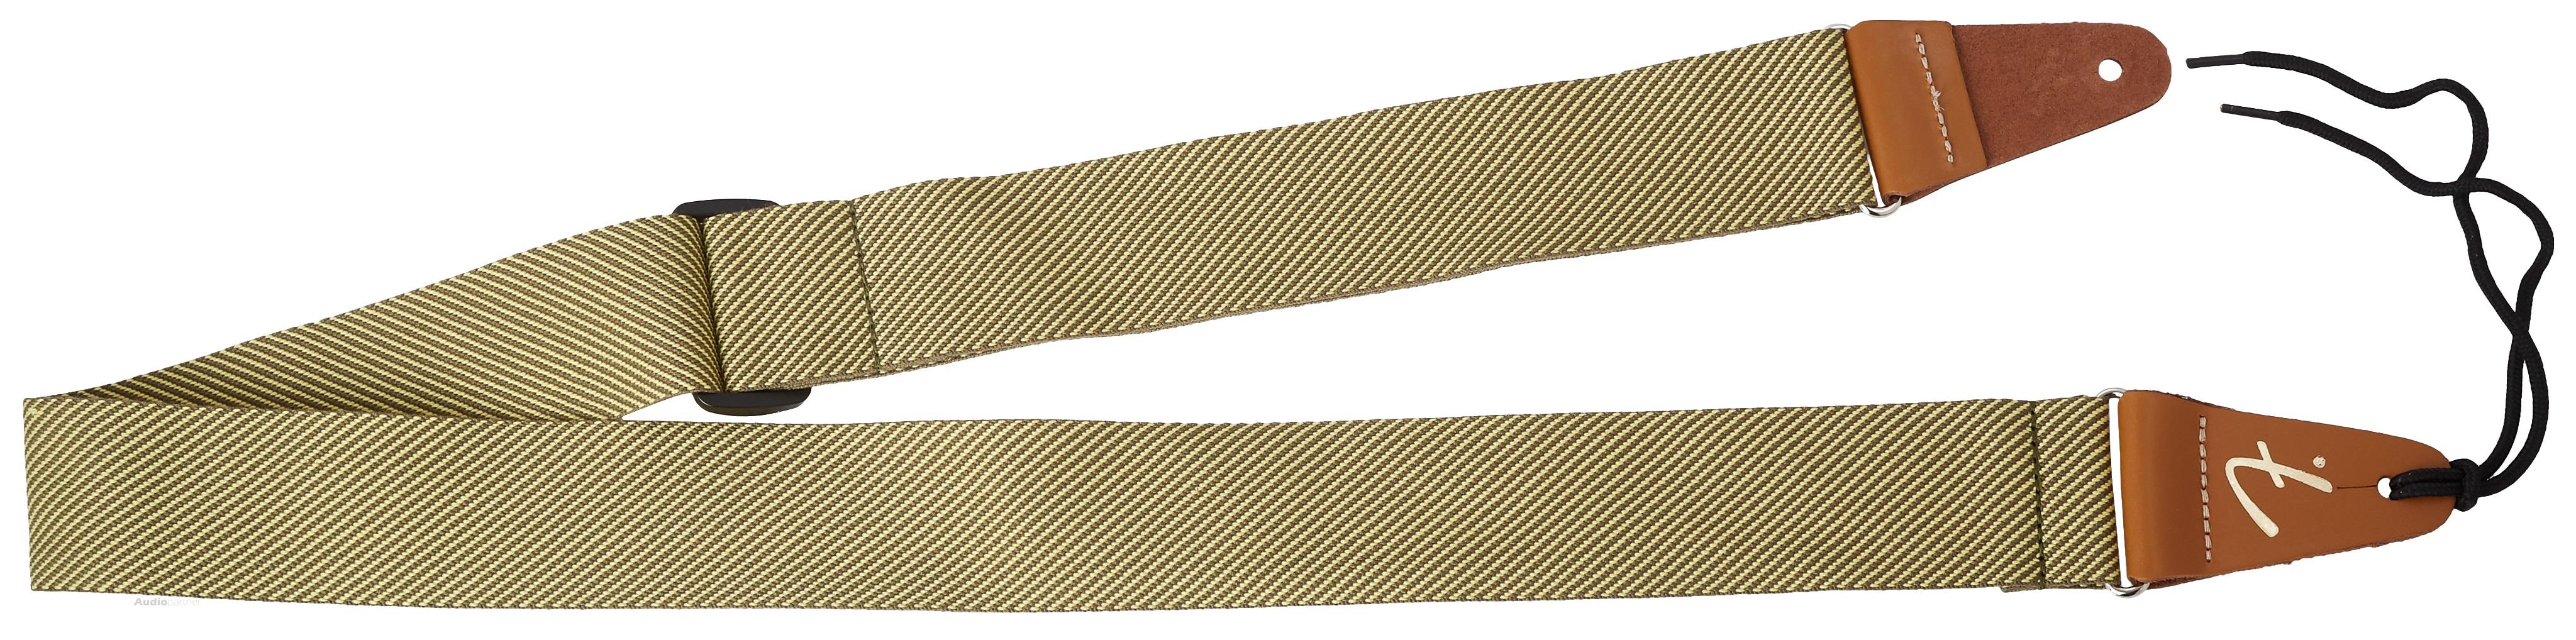 K&M 16280 Guitar Wall Mount